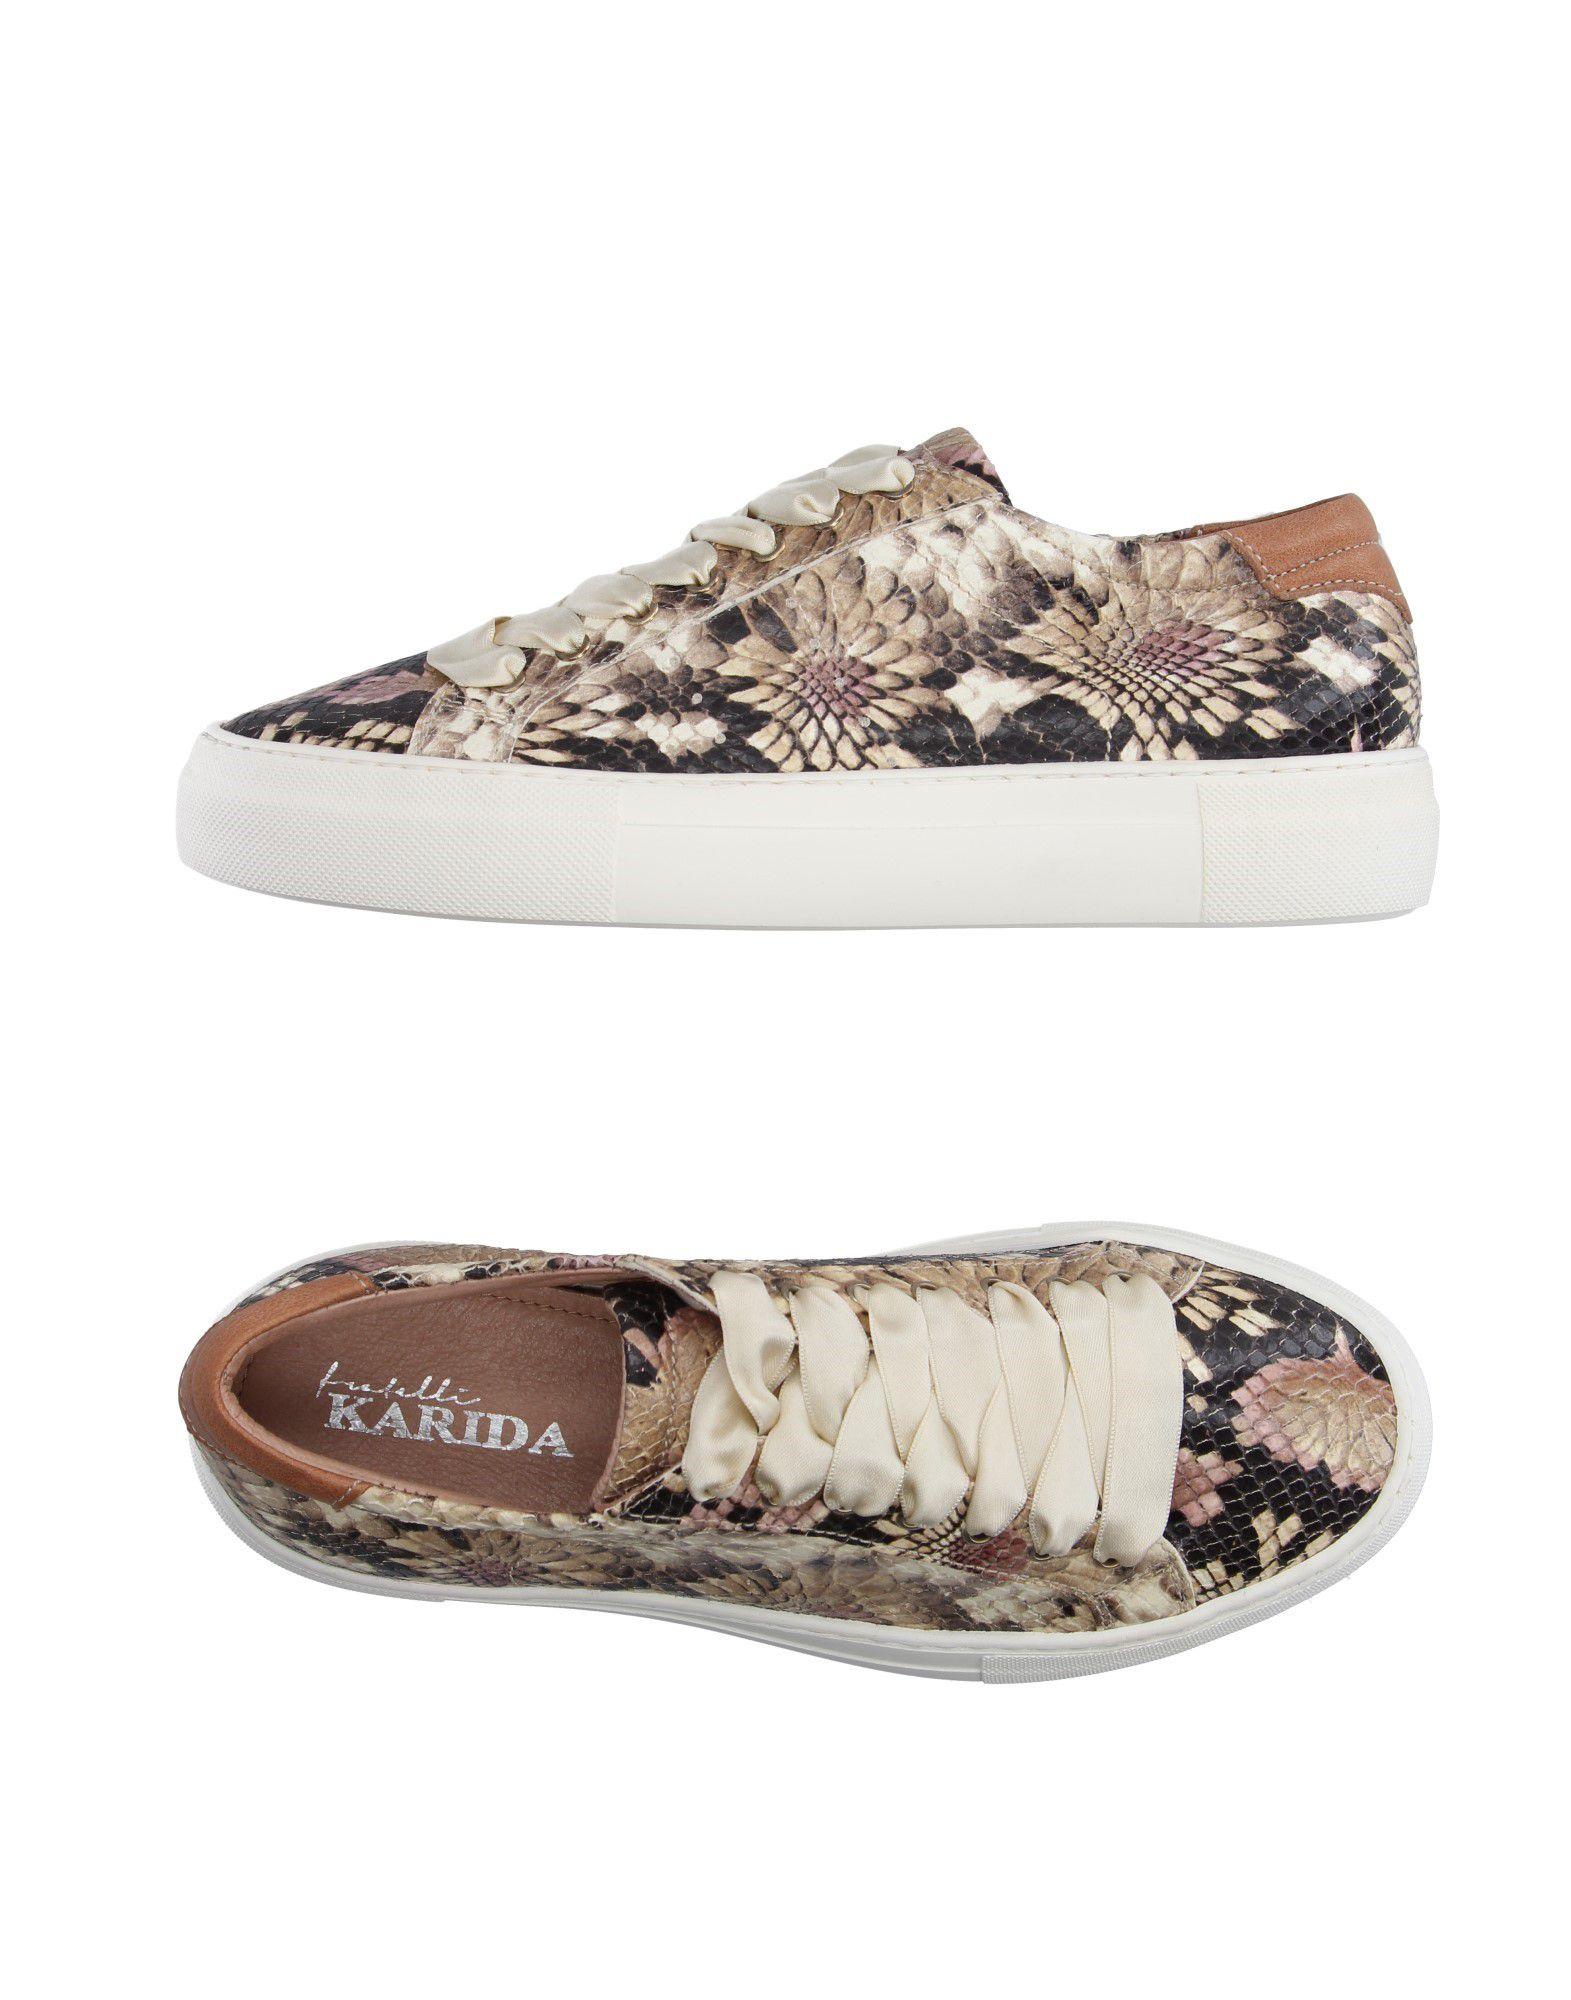 Sneakers Fratelli Karida Femme - Sneakers Fratelli Karida sur